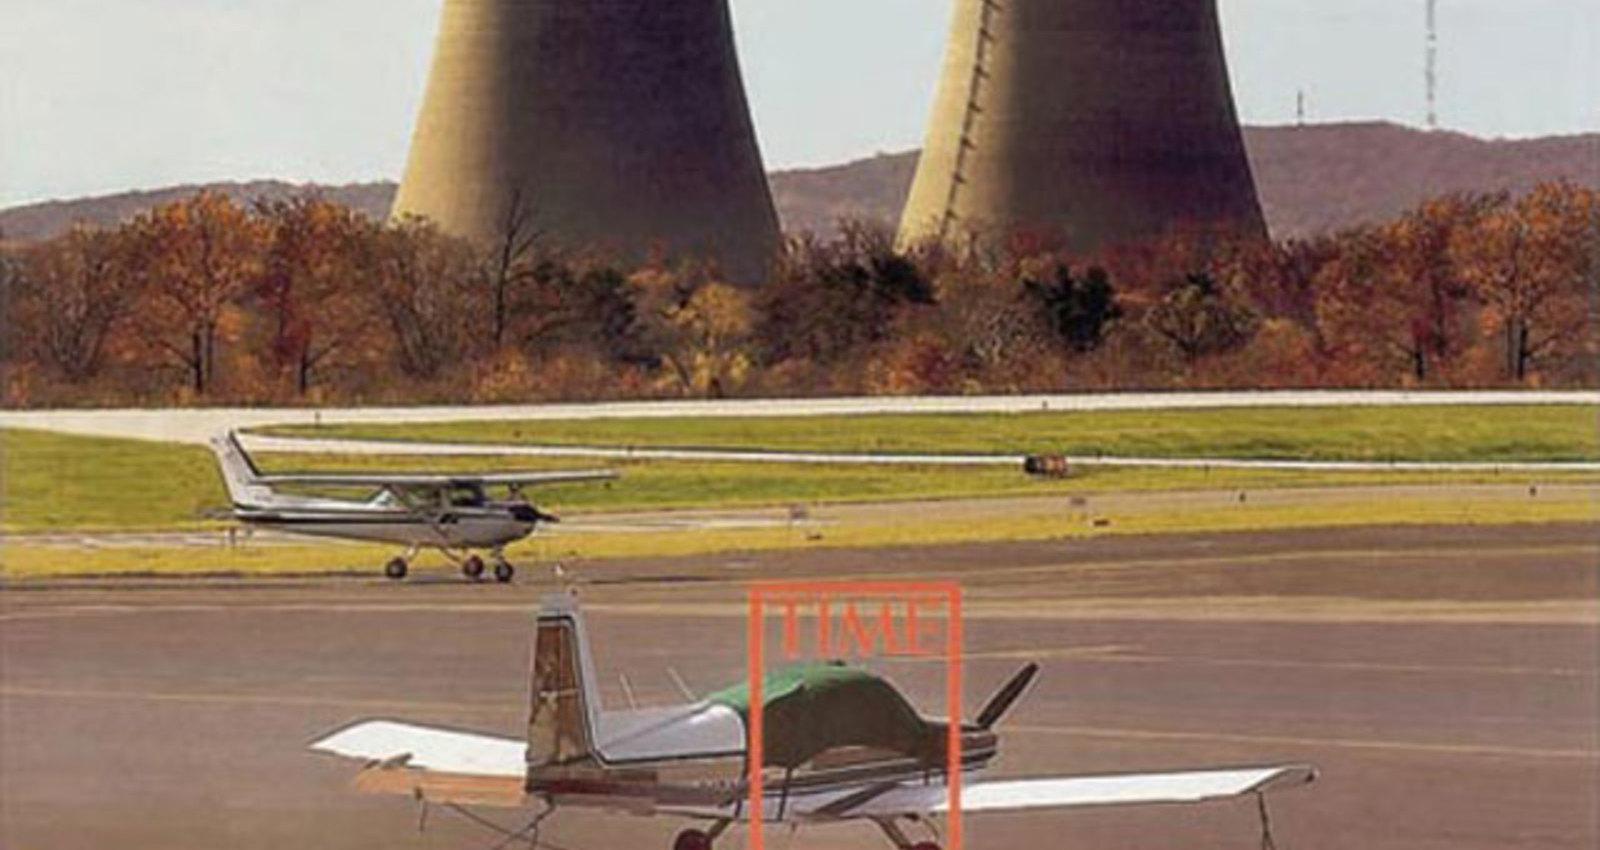 Airport Security, Osbournes, Nuclear Reactor/Plane